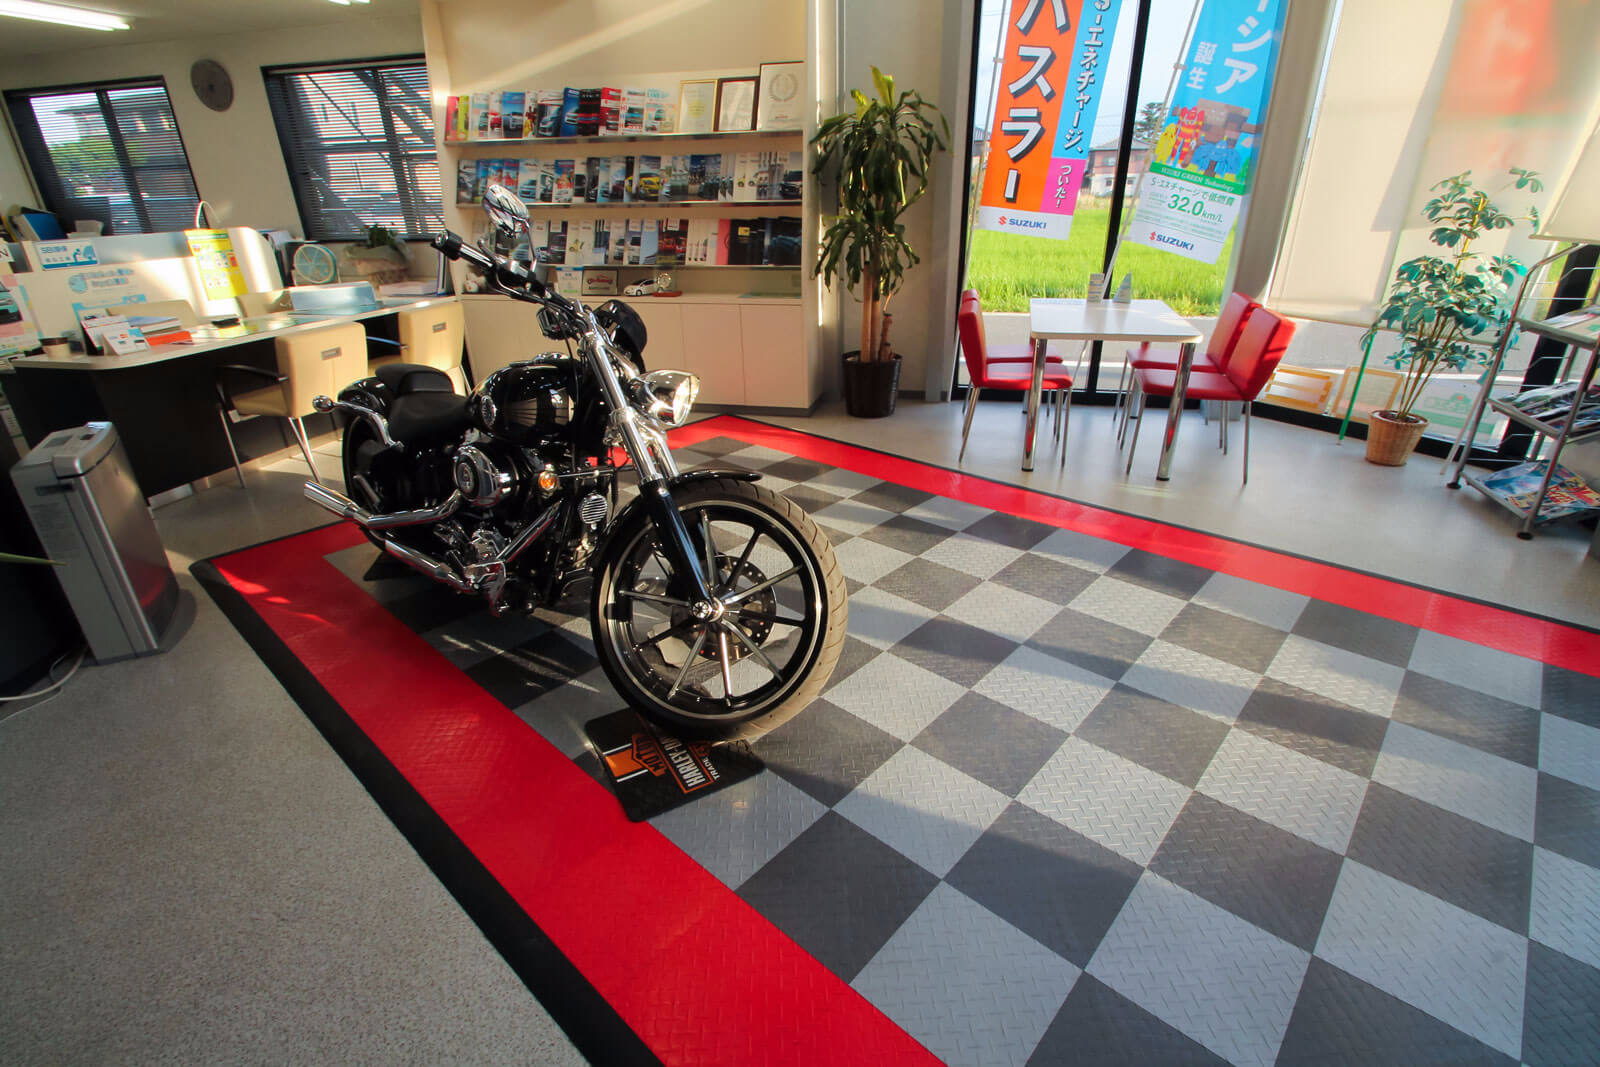 Motorcycle display pad at a dealership in Japan